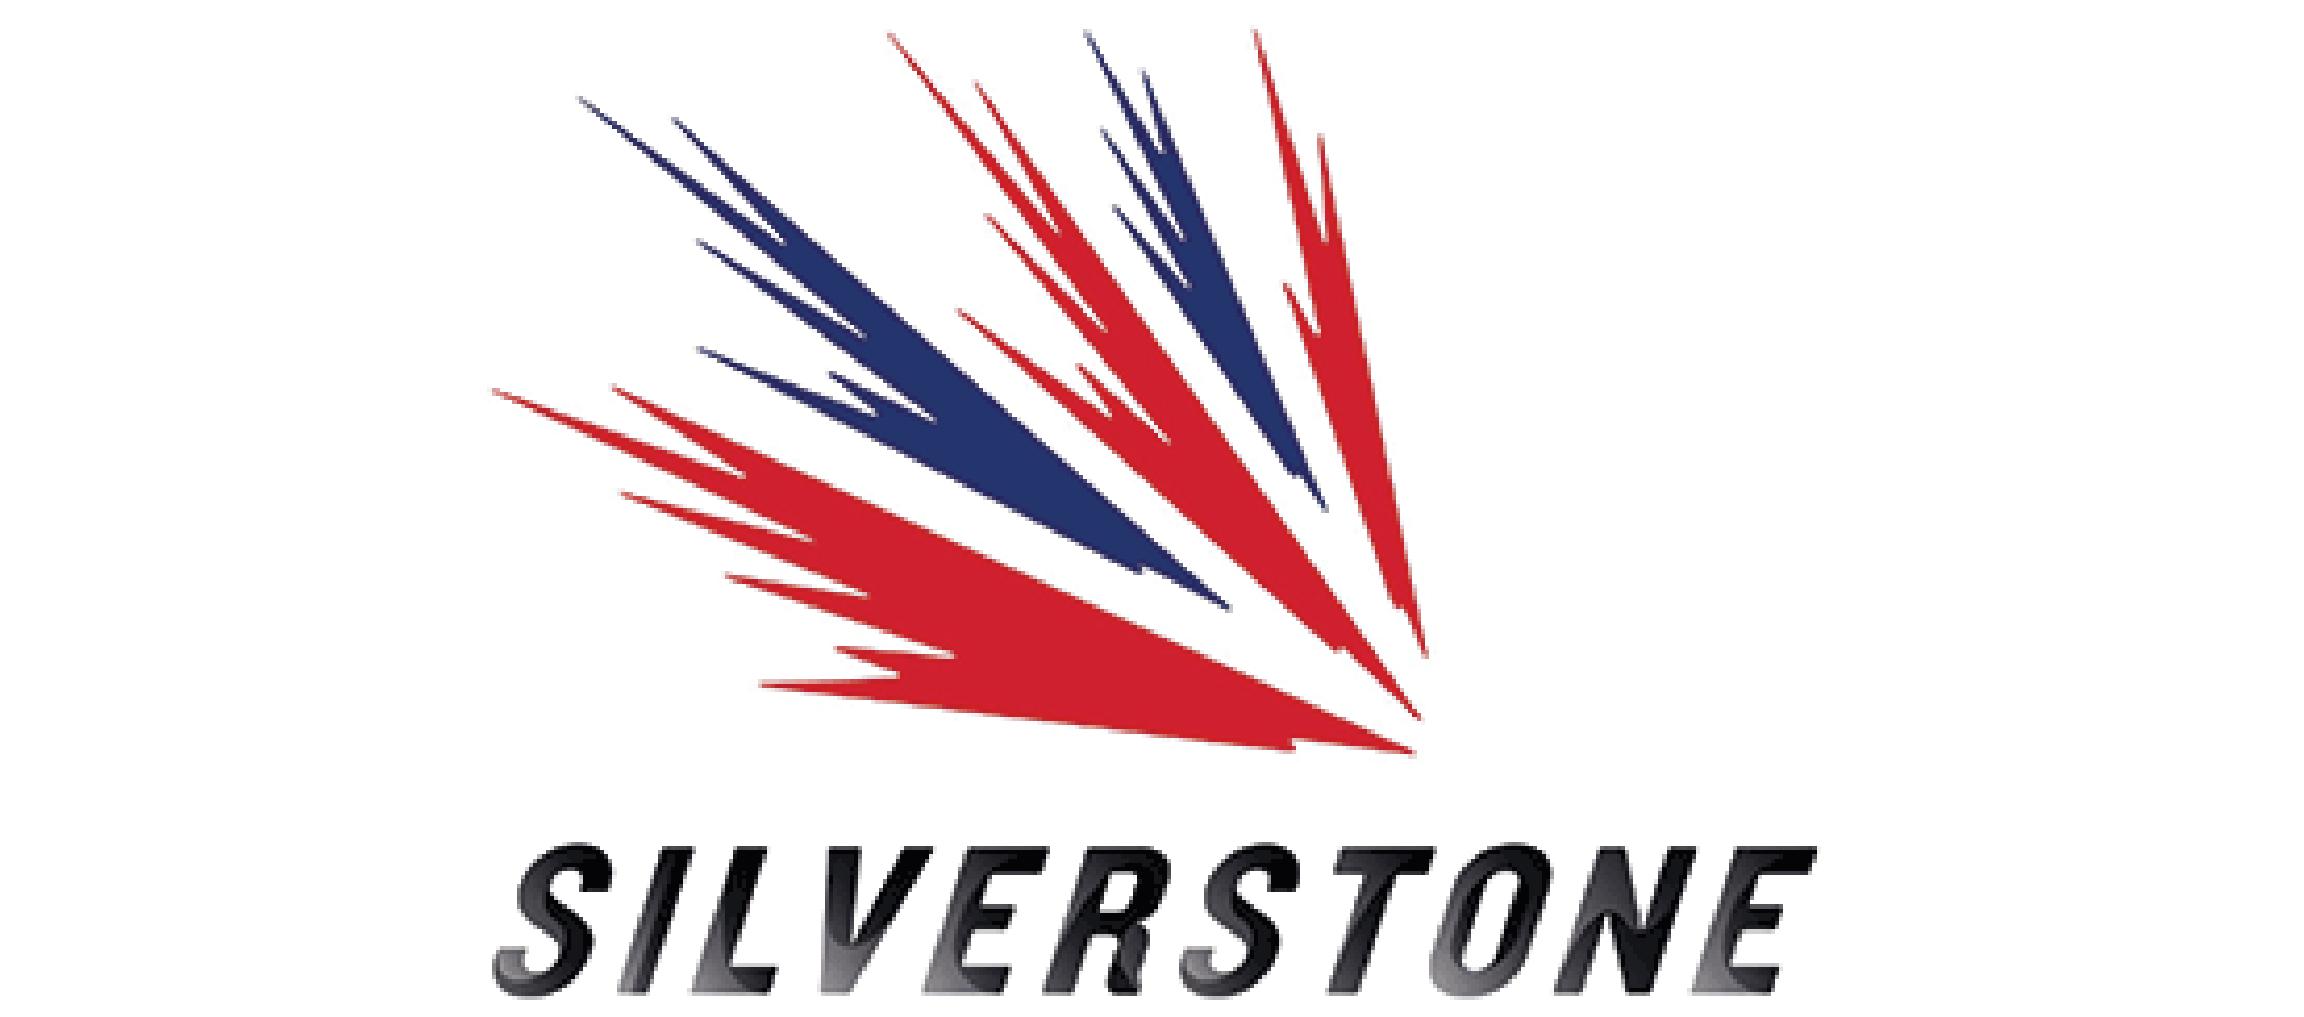 Silverstone International race circuit